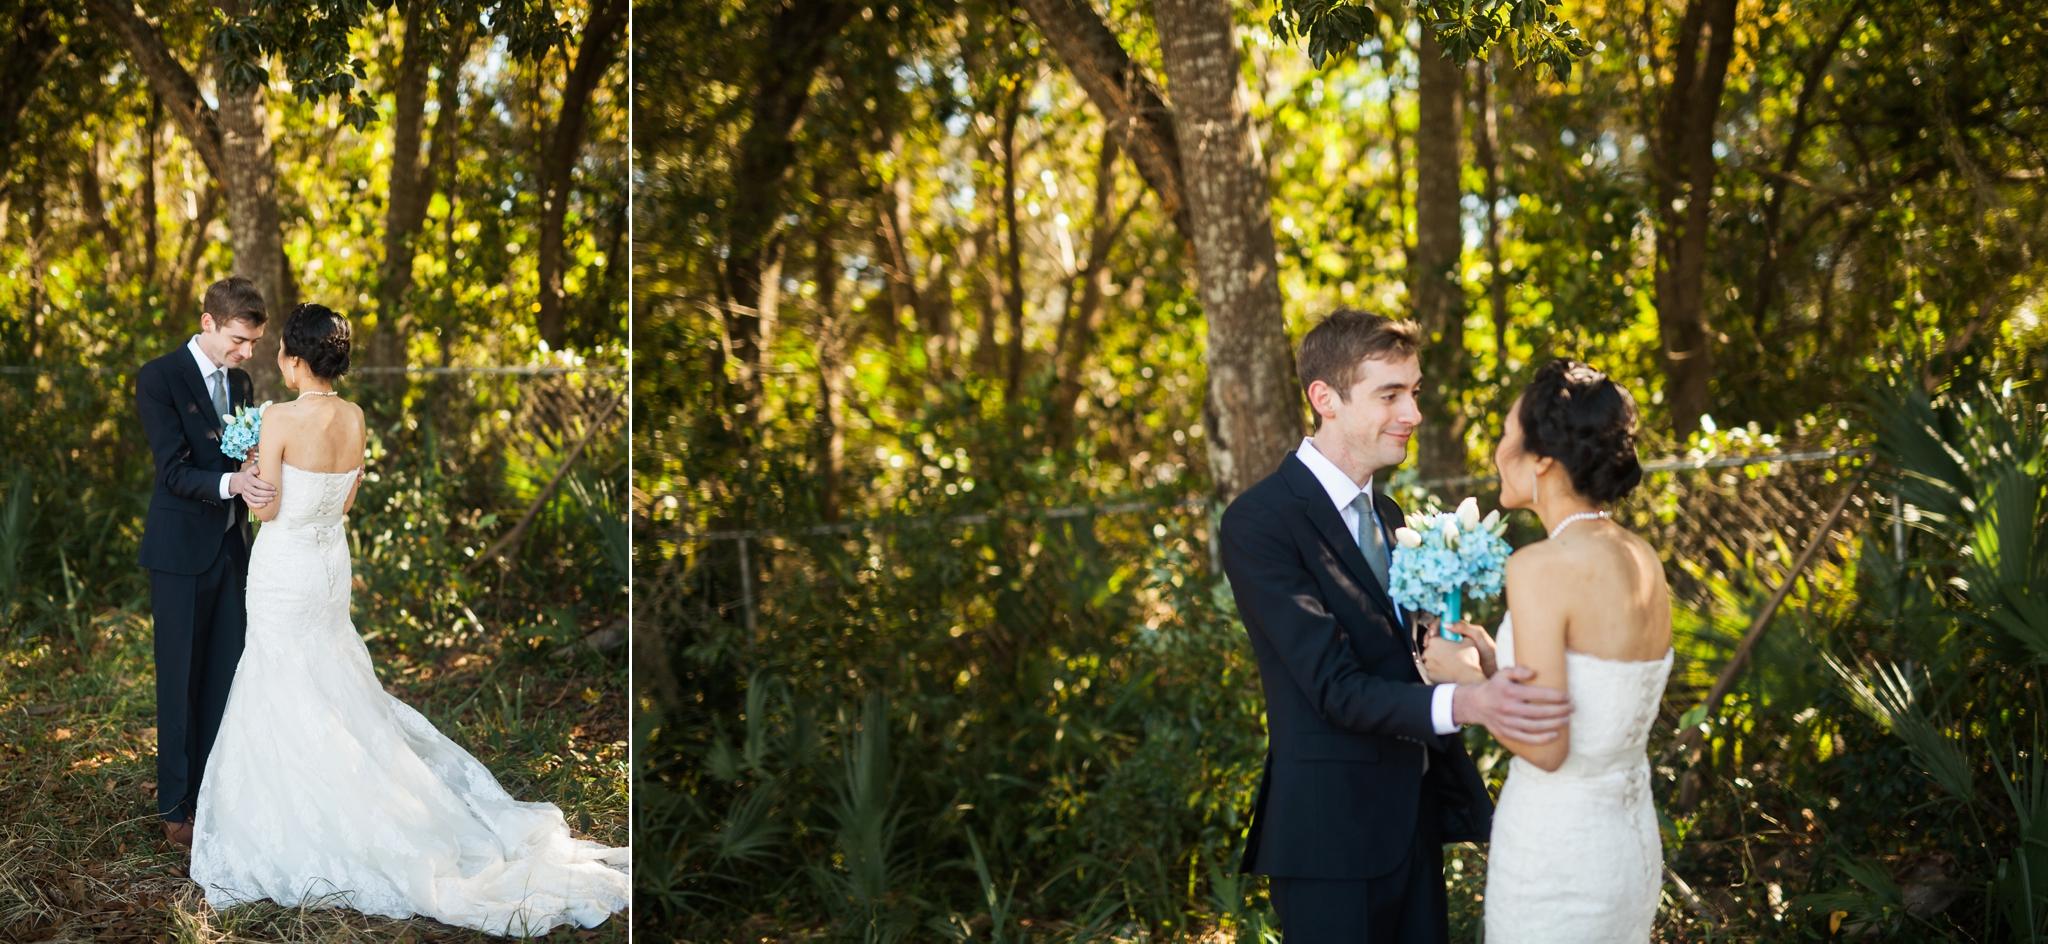 arkansas-wedding-photographer_0012.jpg